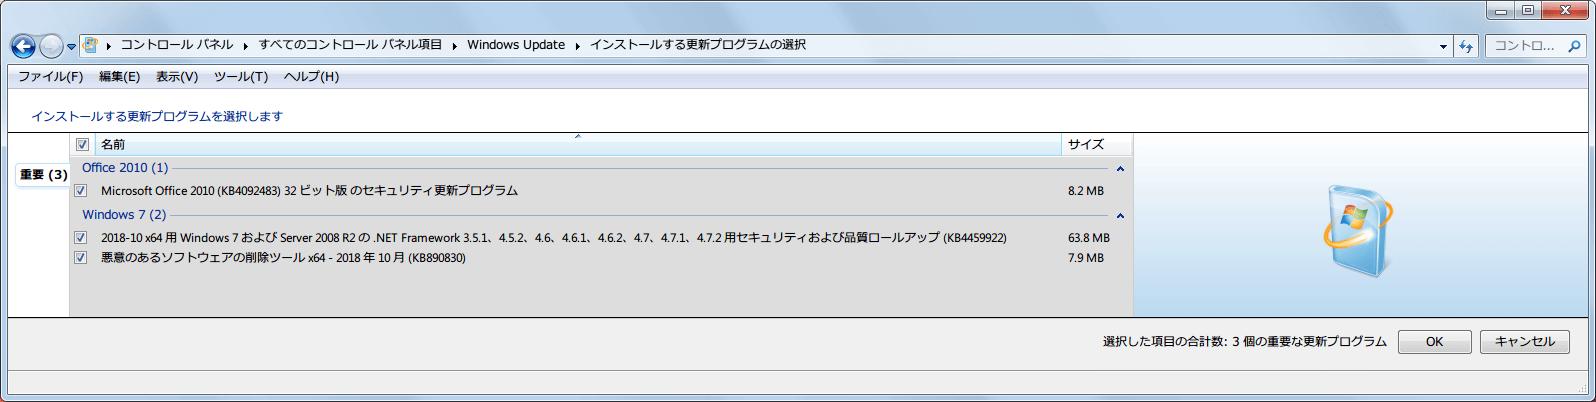 Windows 7 64bit Windows Update 重要 2018年10月公開分更新プログラム(重要)インストール